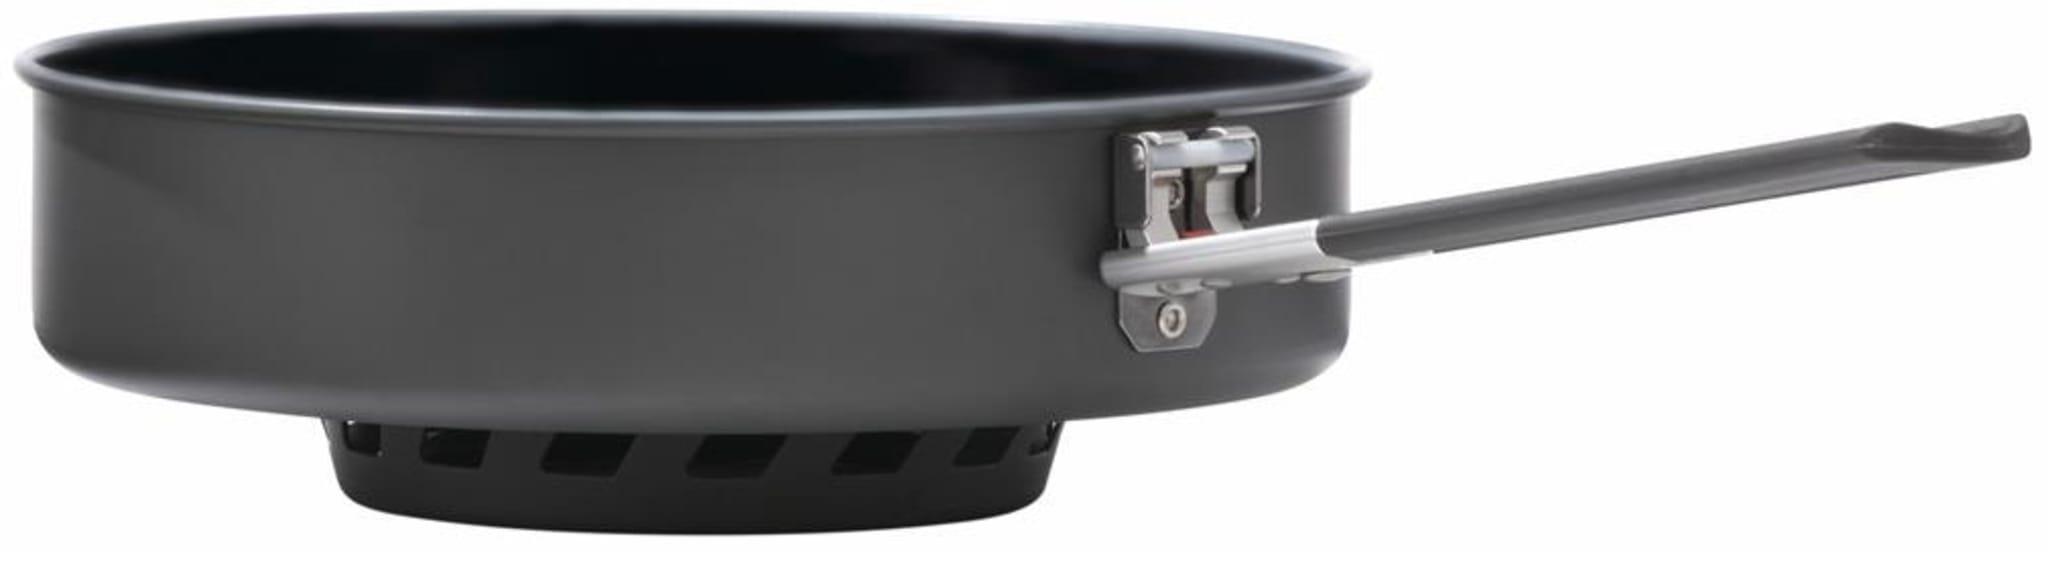 MSR Windburner Ceramic Skillet 2021